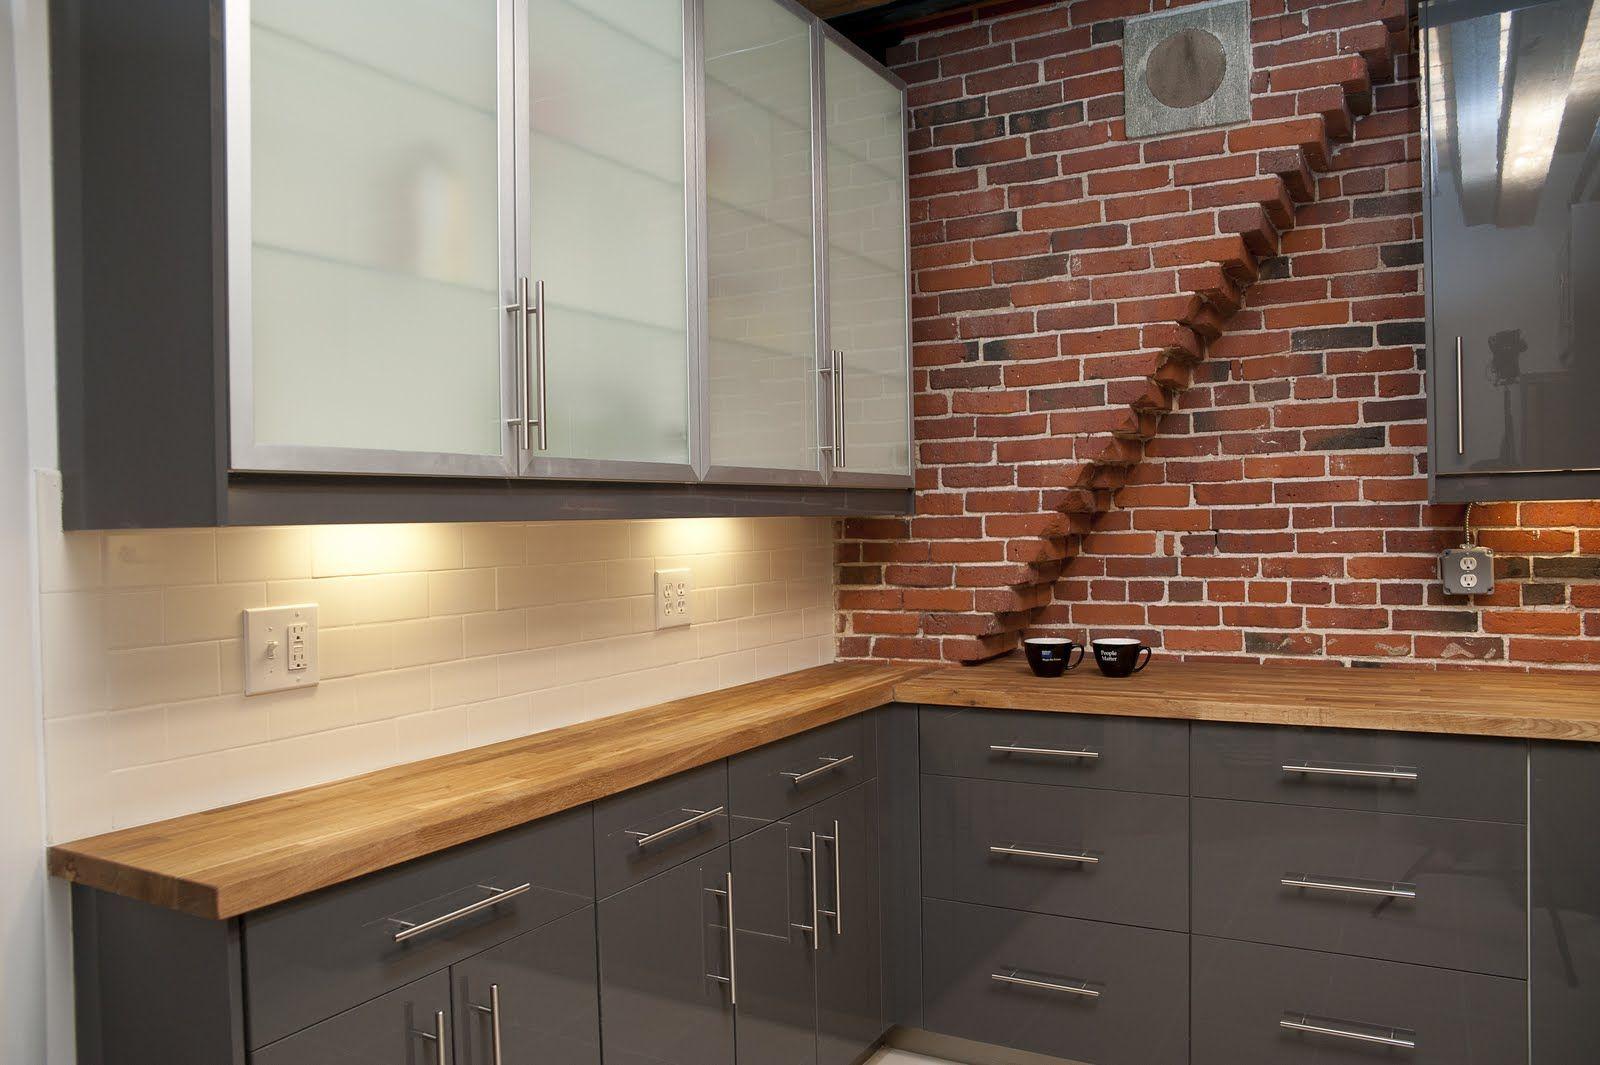 interior brick wall kitchen - google search | art | pinterest